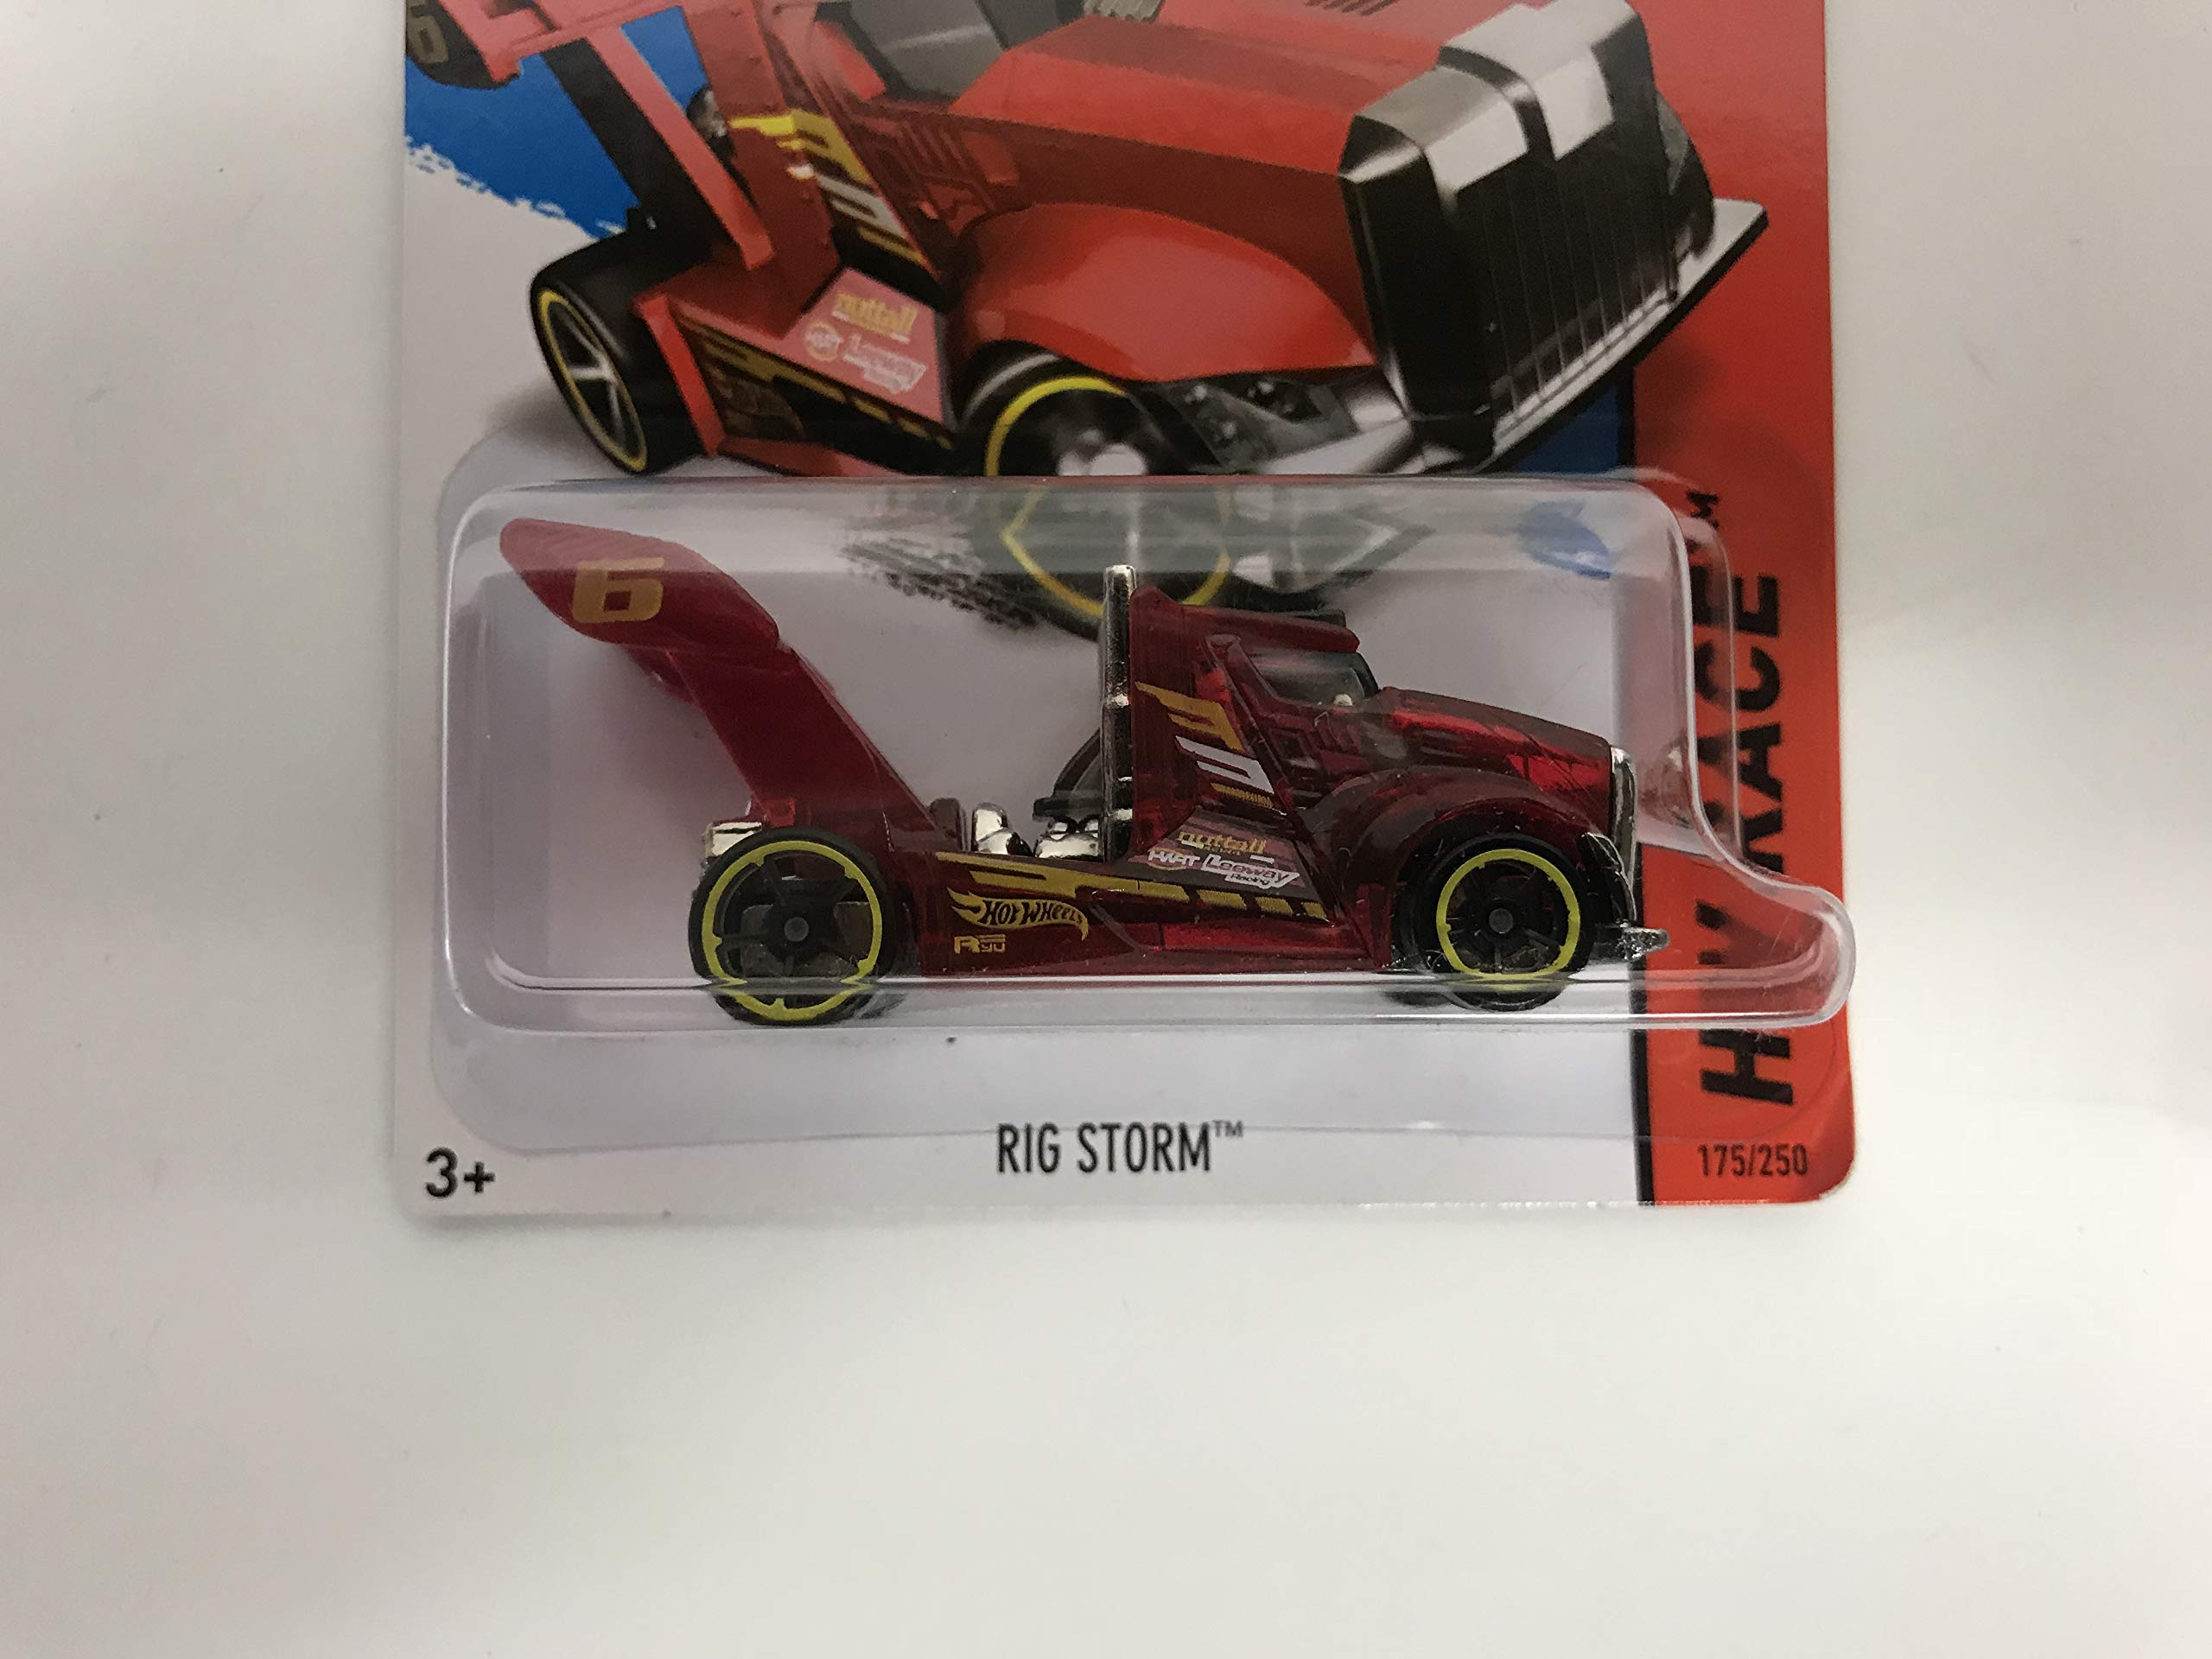 Rig Storm 2014 Hot Wheels HW RACE 175/250 diecast car